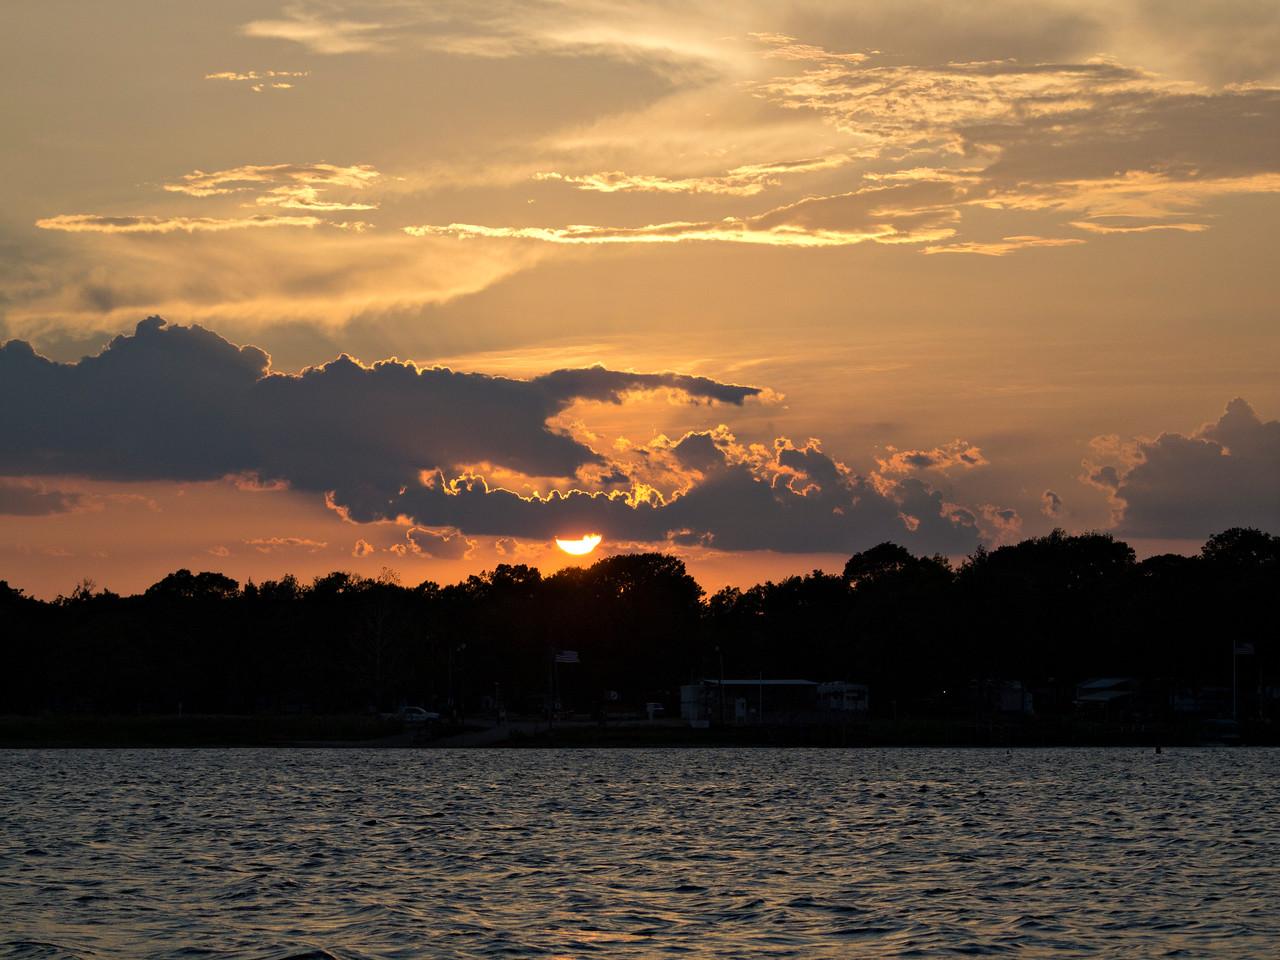 Sunset over Hideaway Harbor - Lake Fork, Texas  Order Code: B41